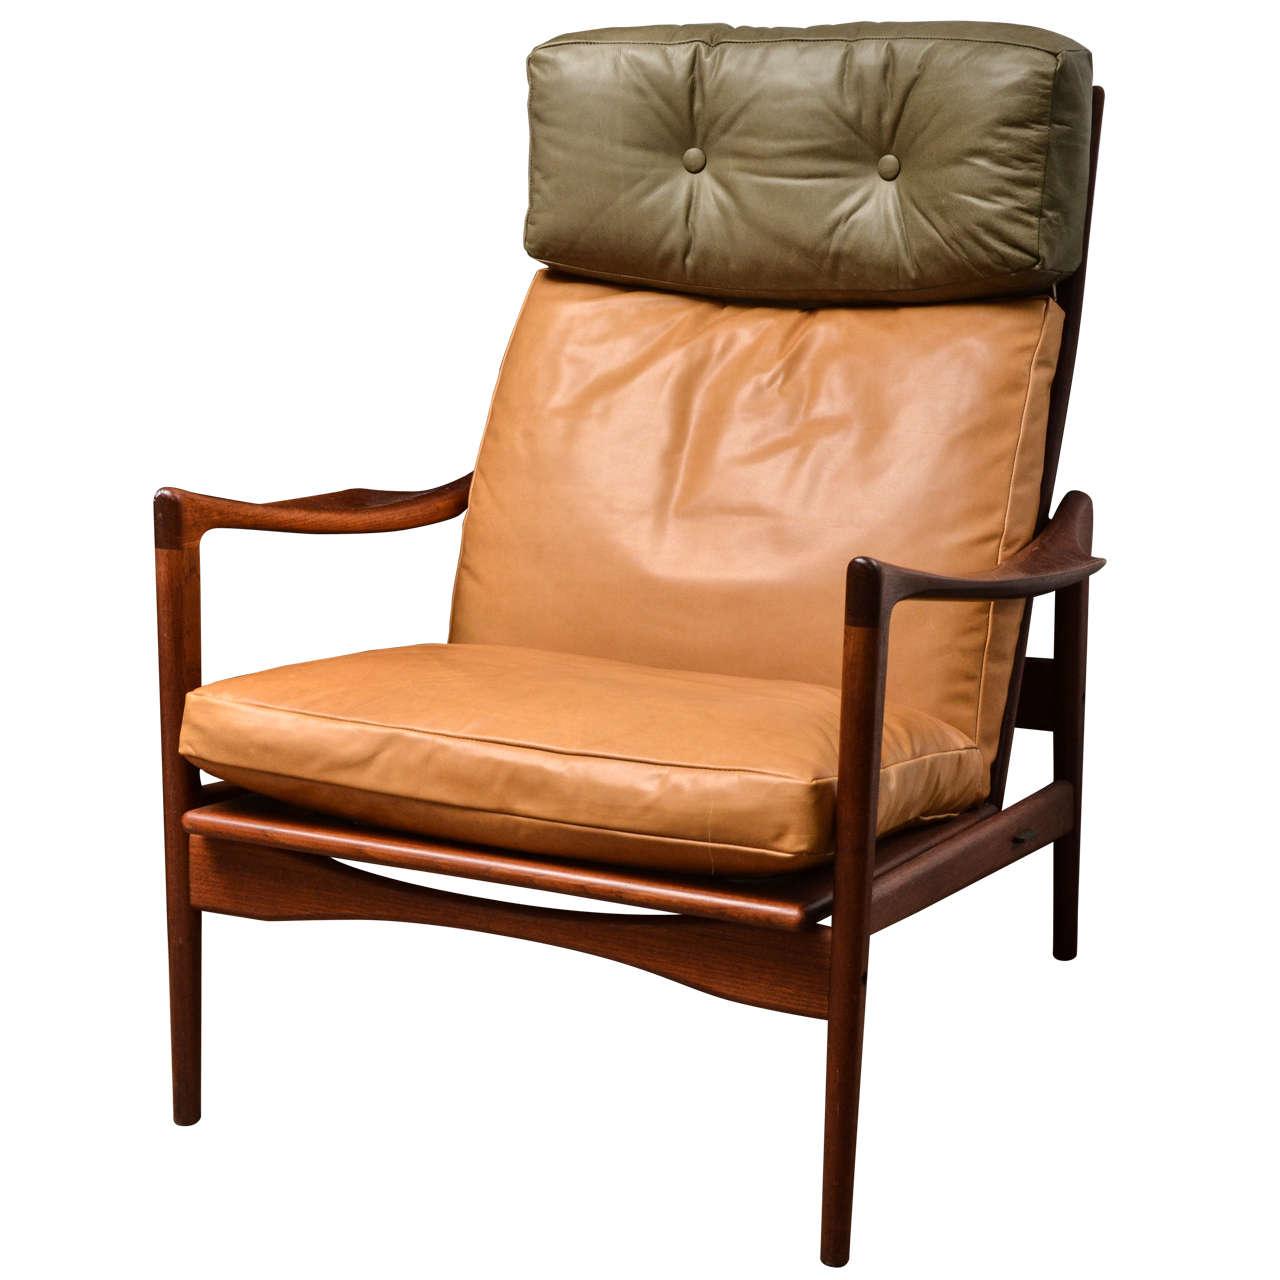 Mid-Century scandinavian Lounge chair